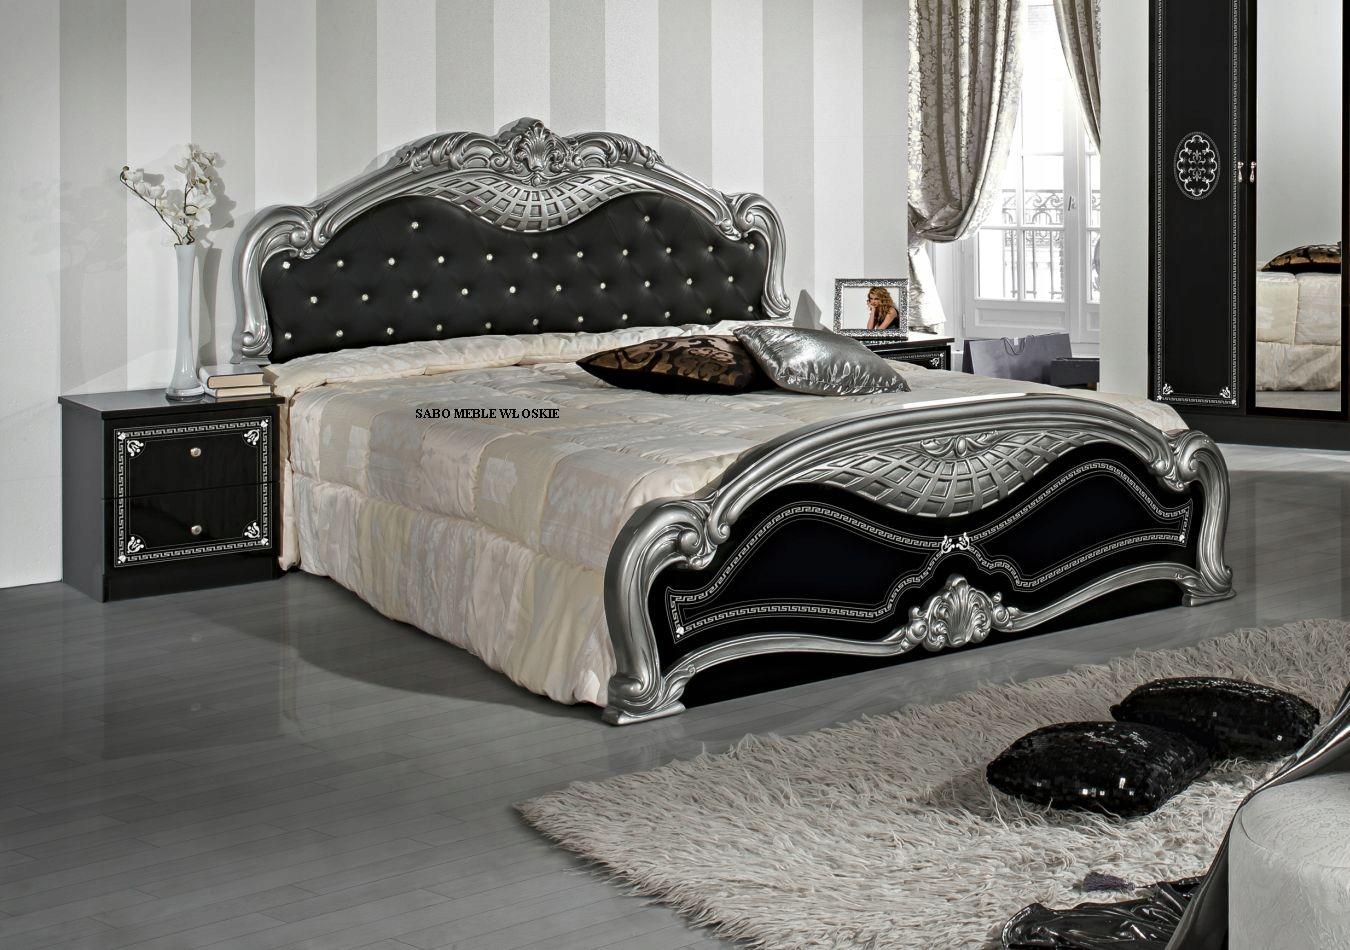 Włoska Sypialnia Lux Czarno Srebrna Sabo Meble 8024306837